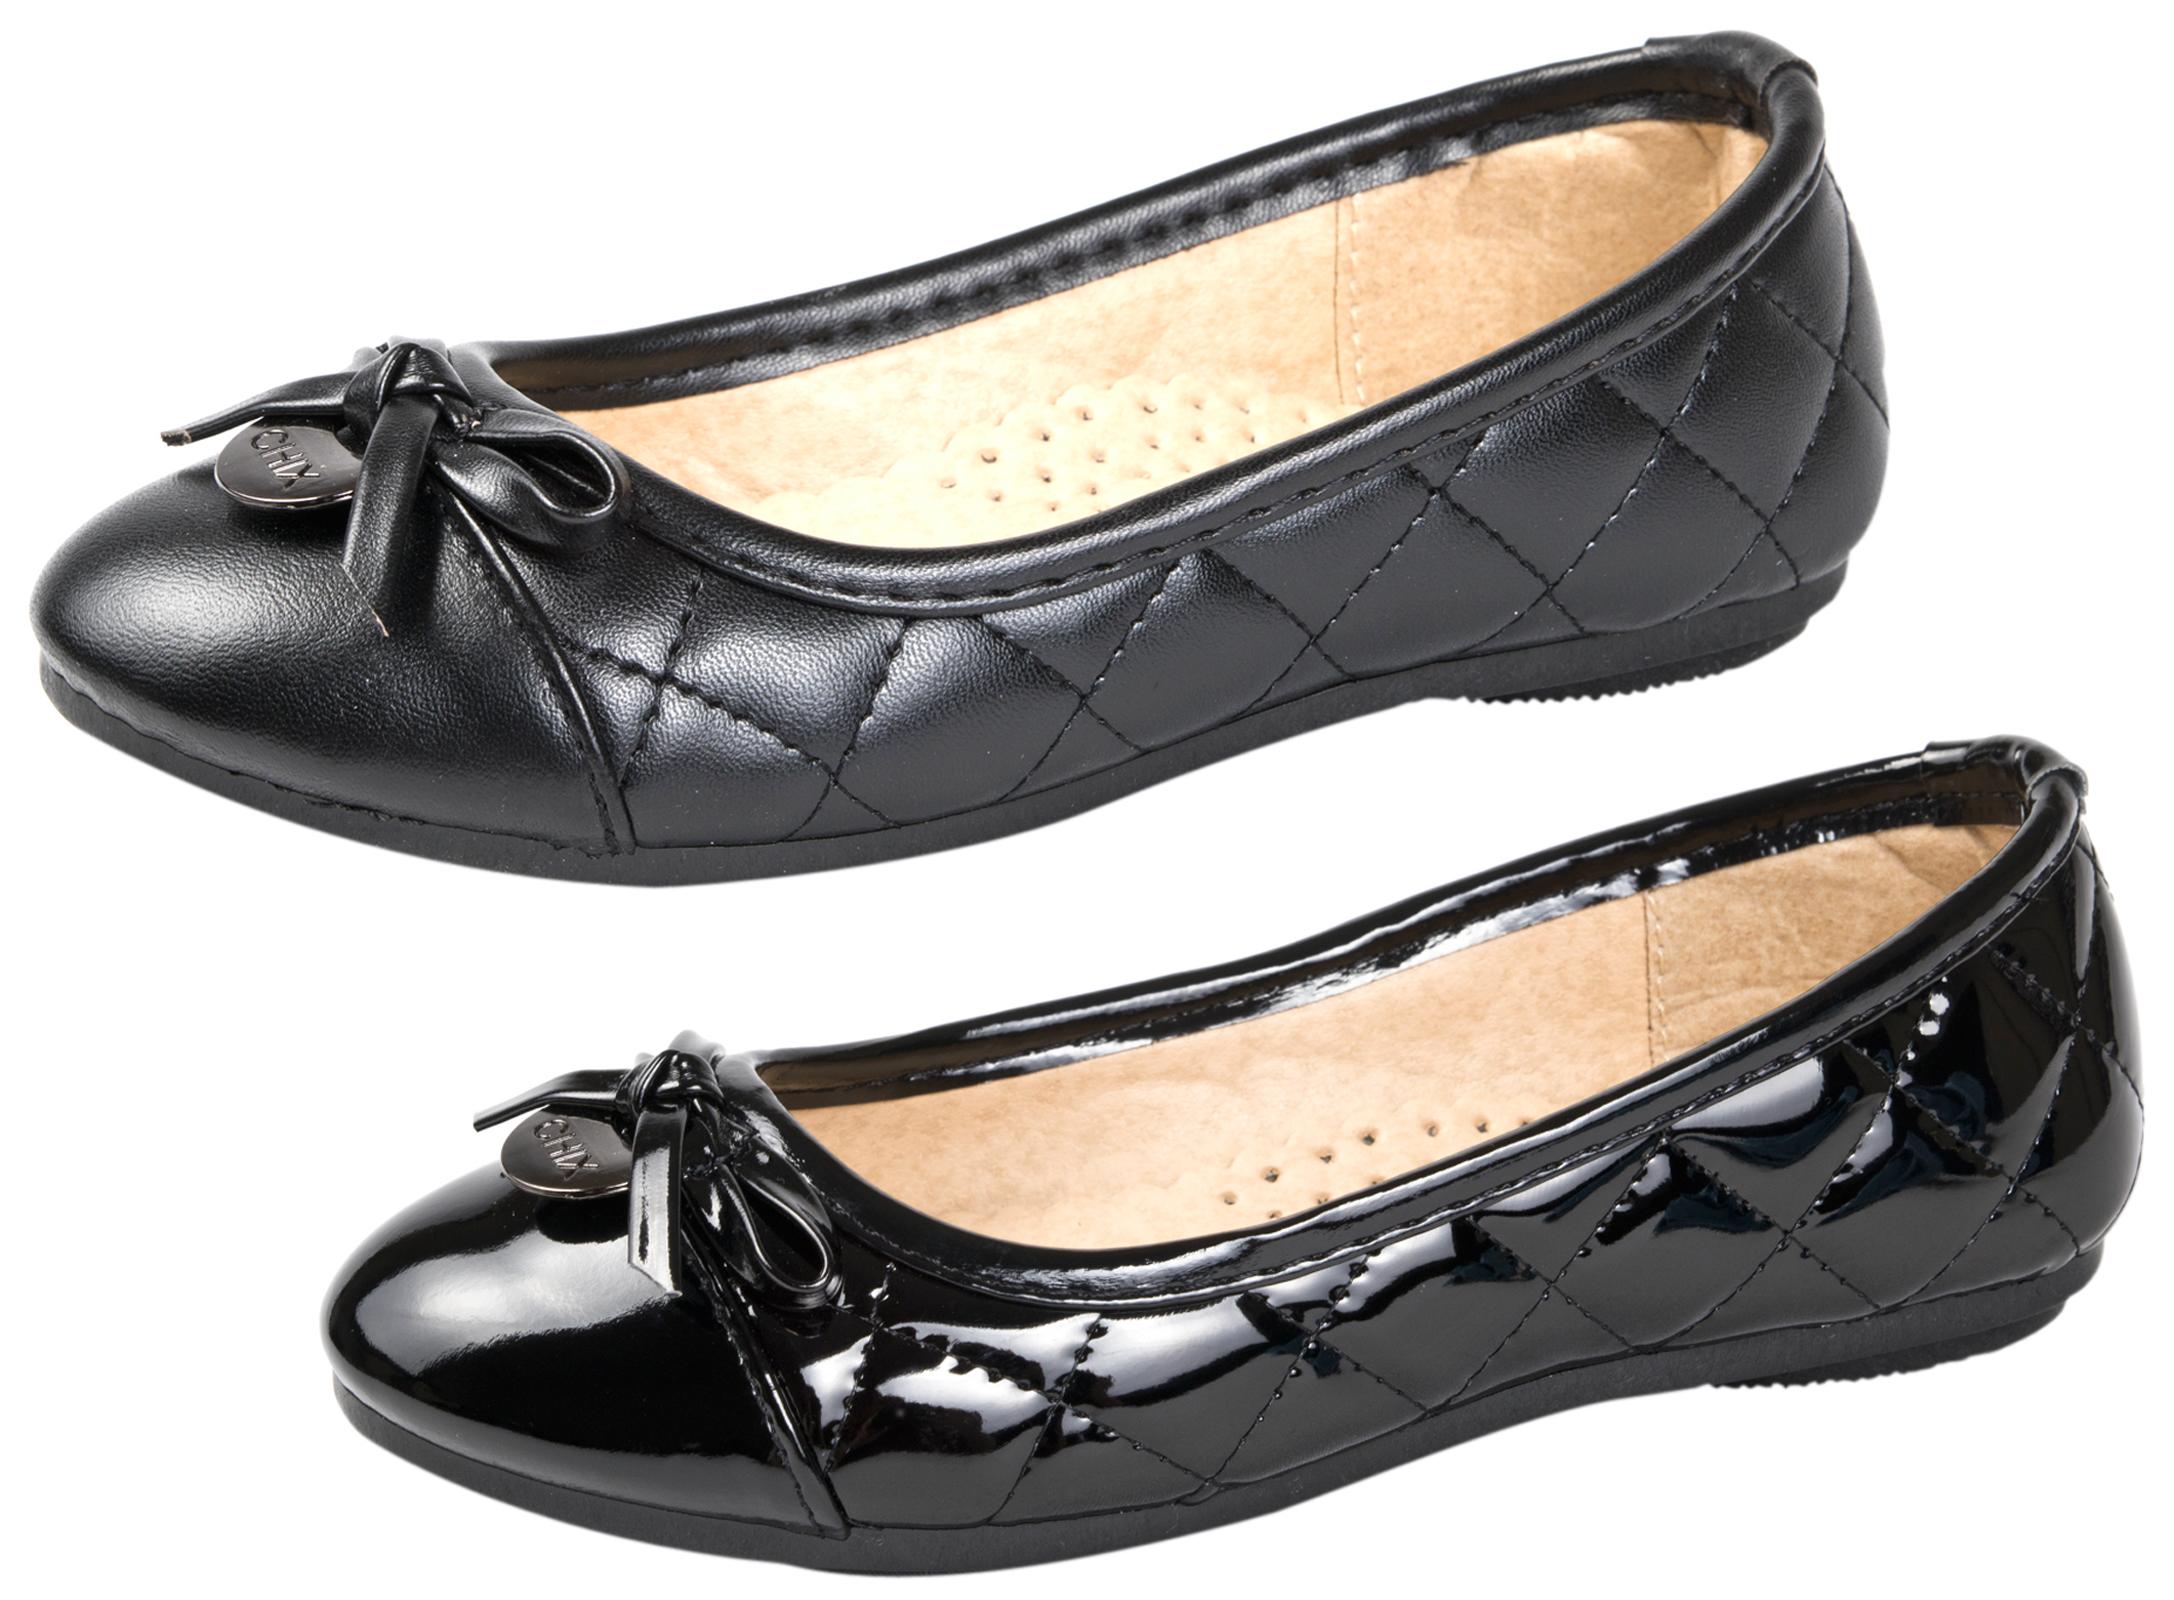 Ladies Girls Quilted Ballet Pumps Black